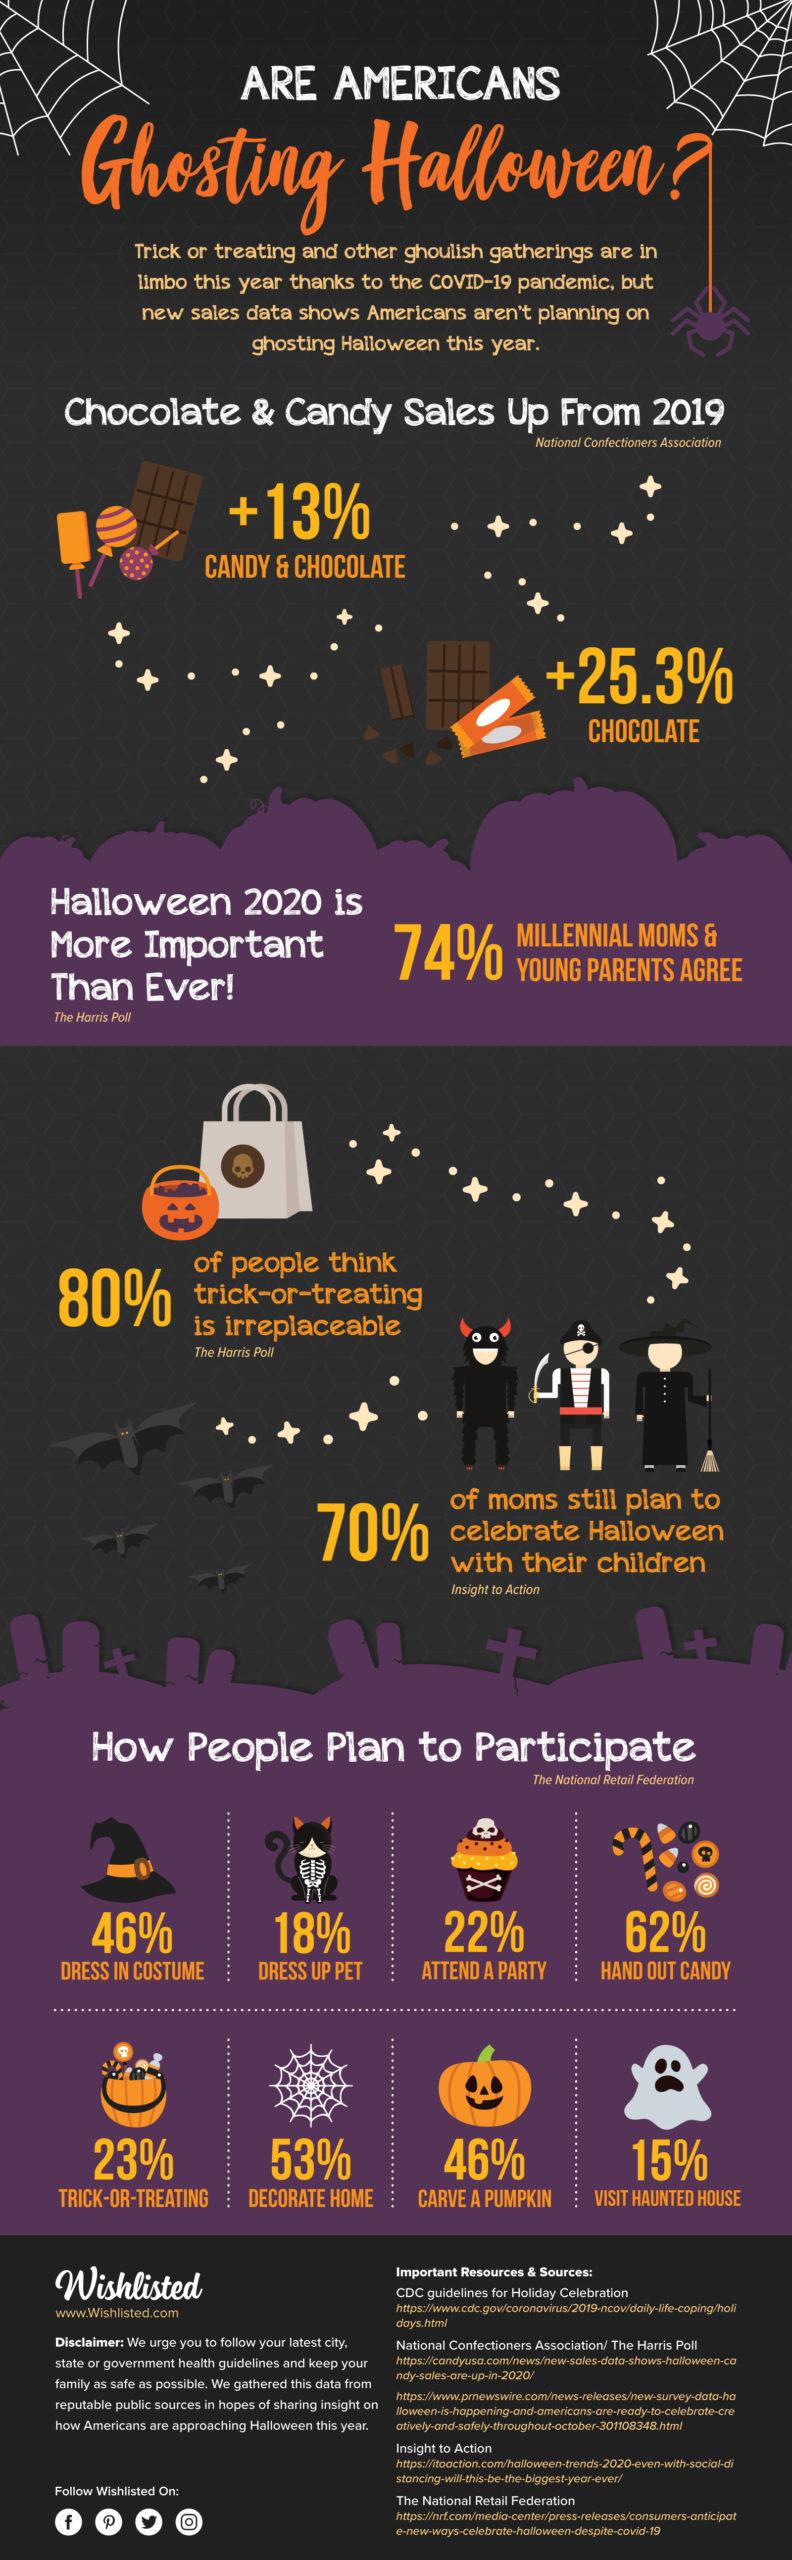 Halloween 2020 Infographic